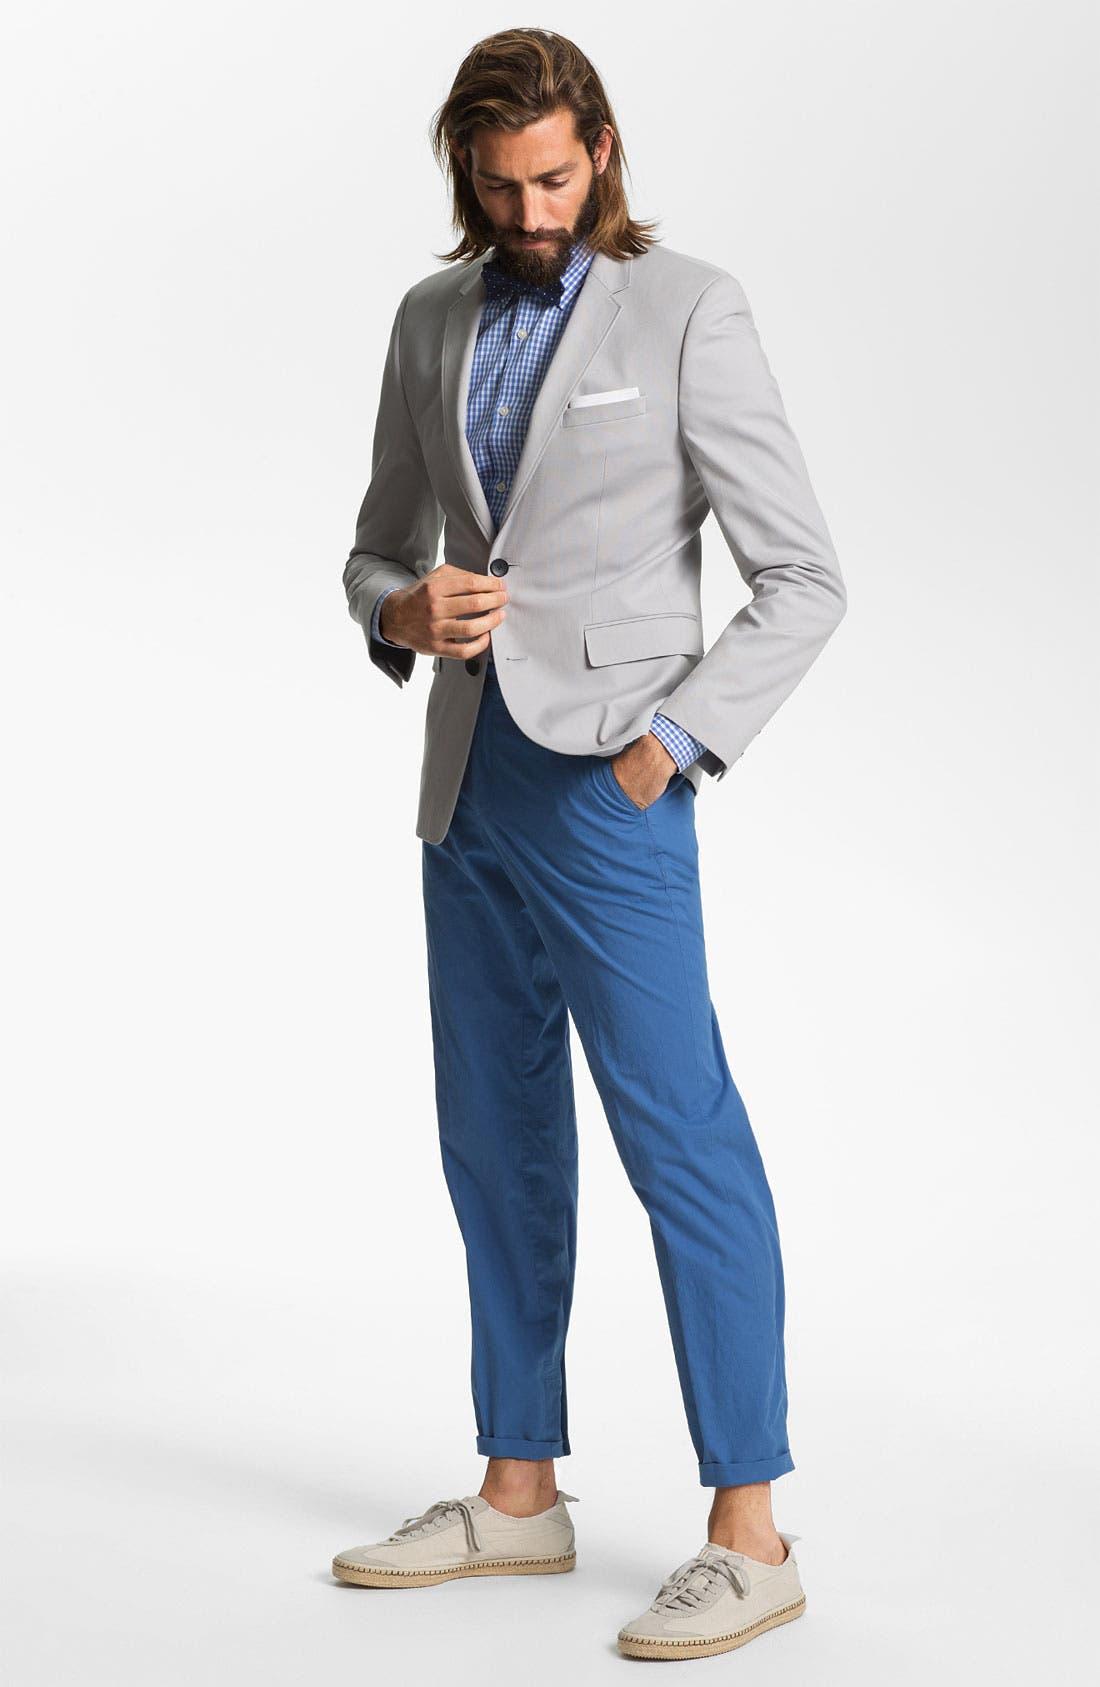 ZZDNUHUGO BOSS, HUGO 'Aeris' Trim Fit Cotton Blend Blazer, Alternate thumbnail 3, color, 030